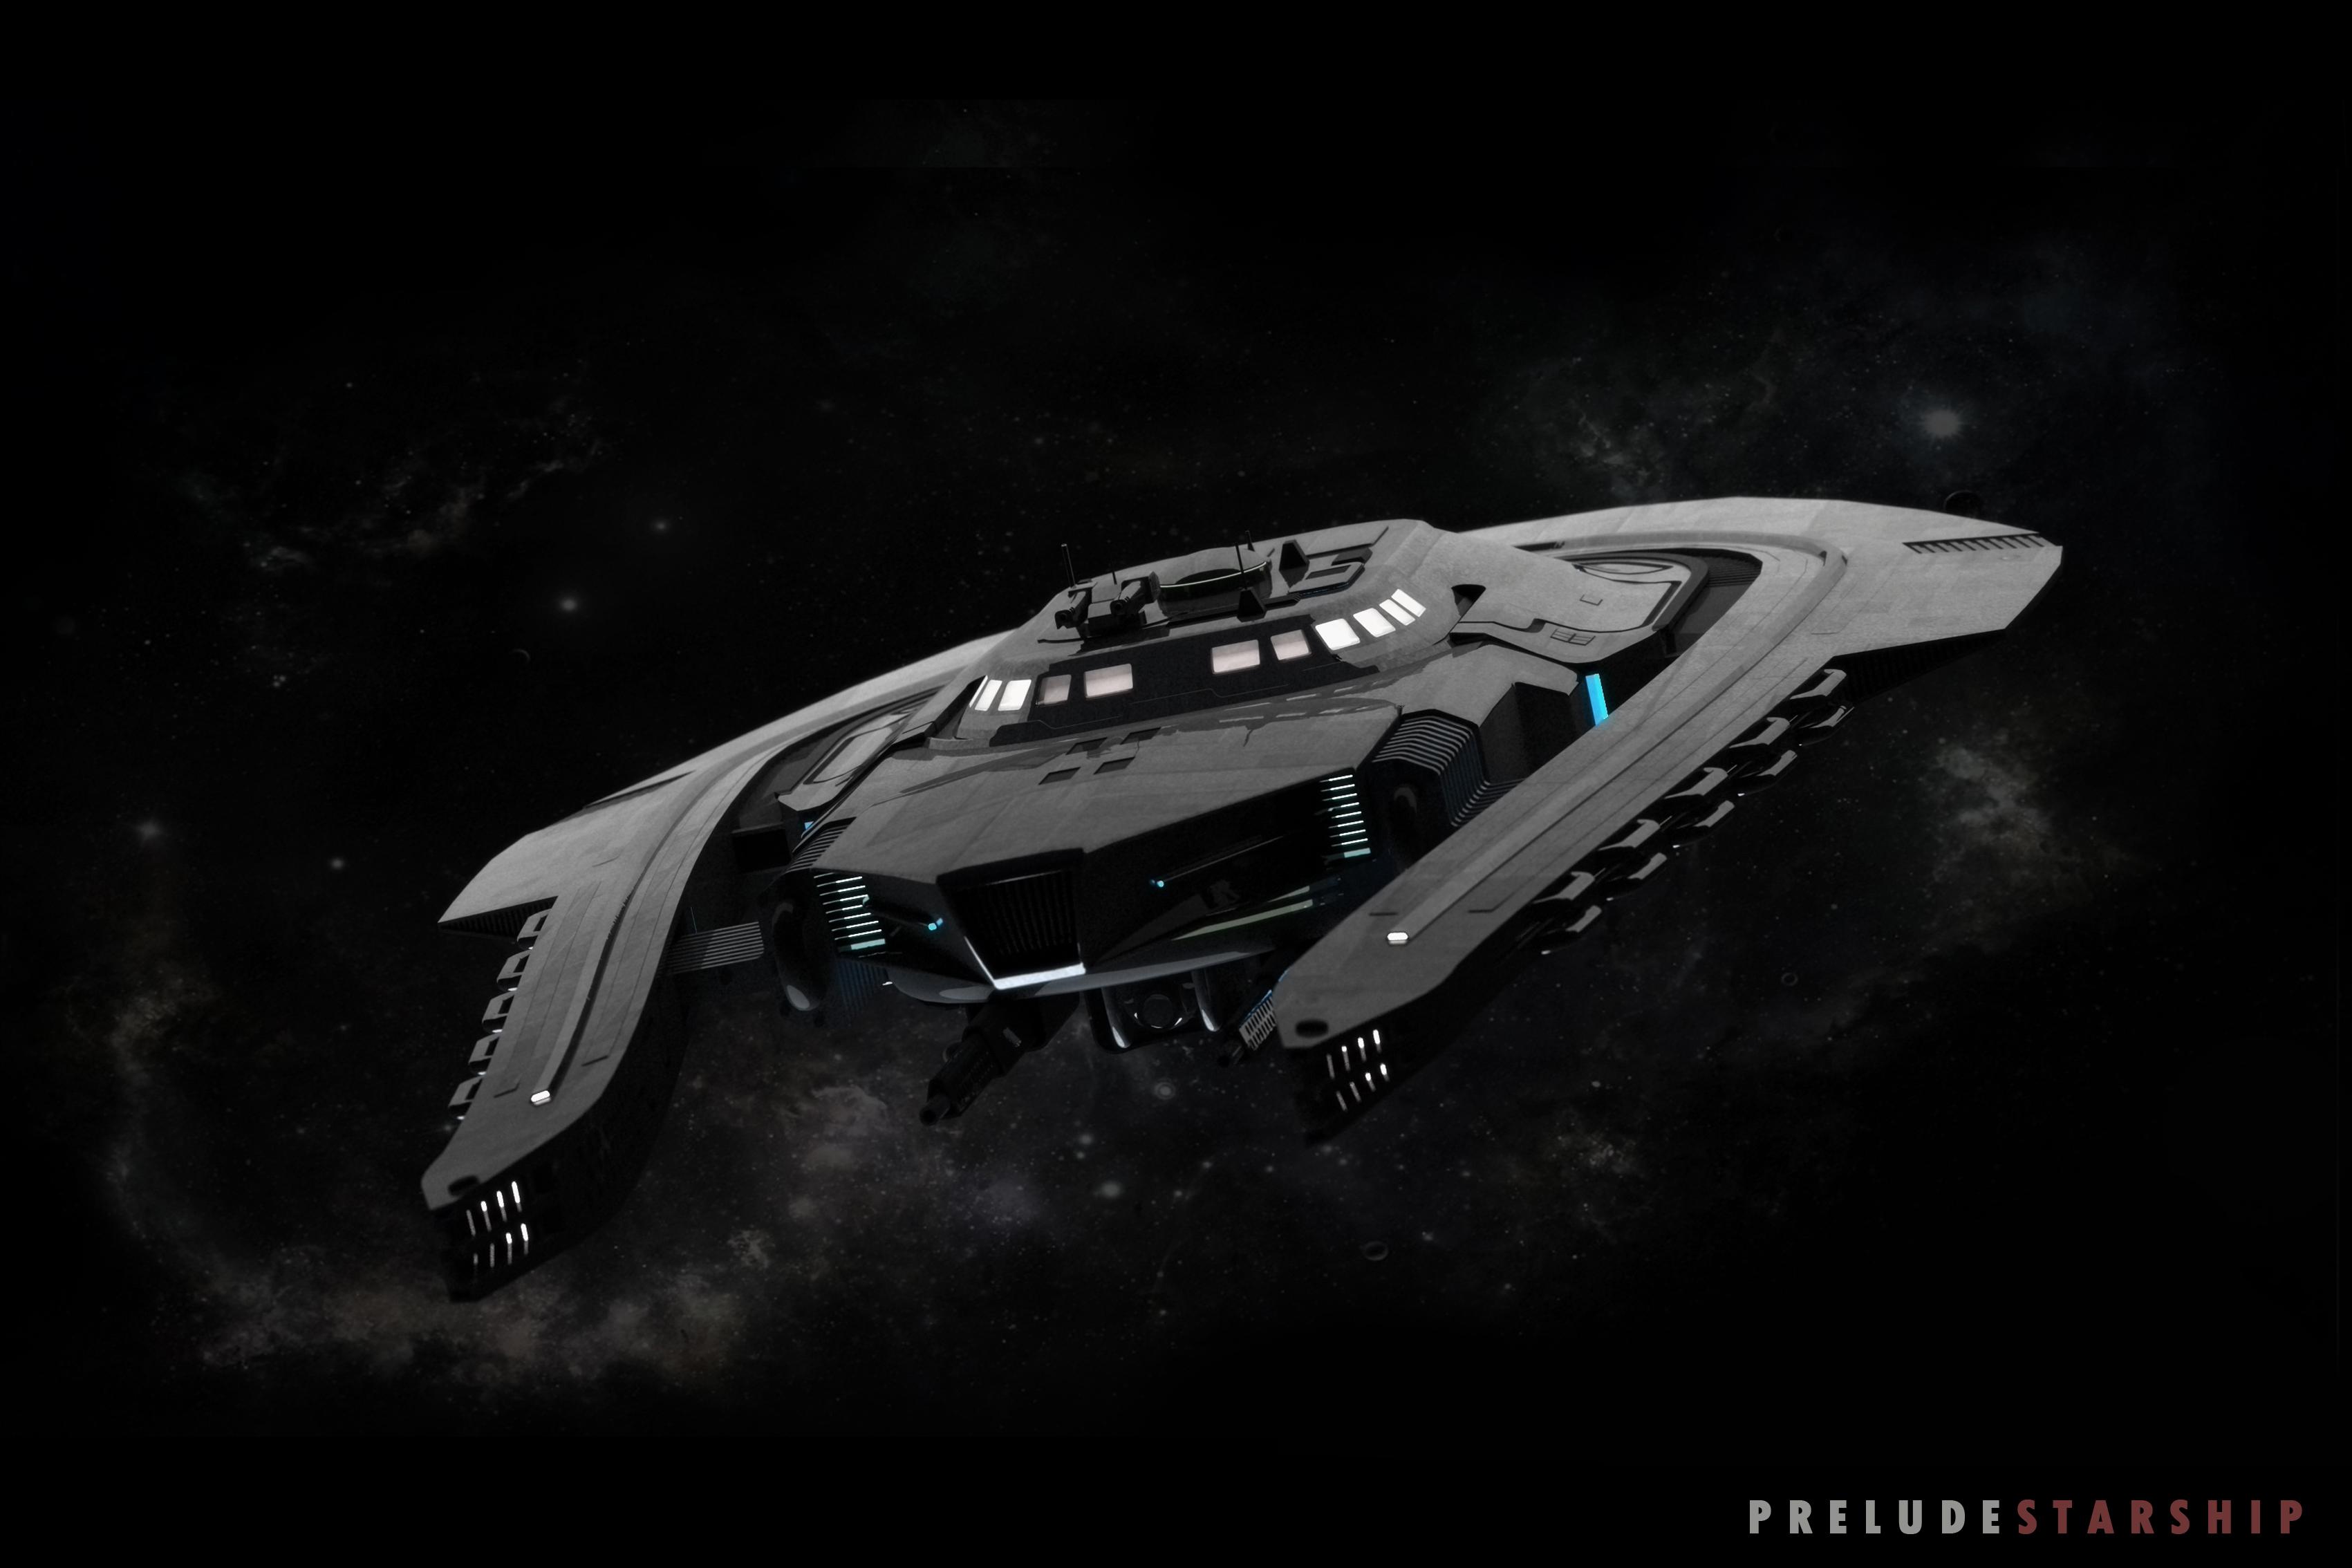 star trek future starship - photo #39